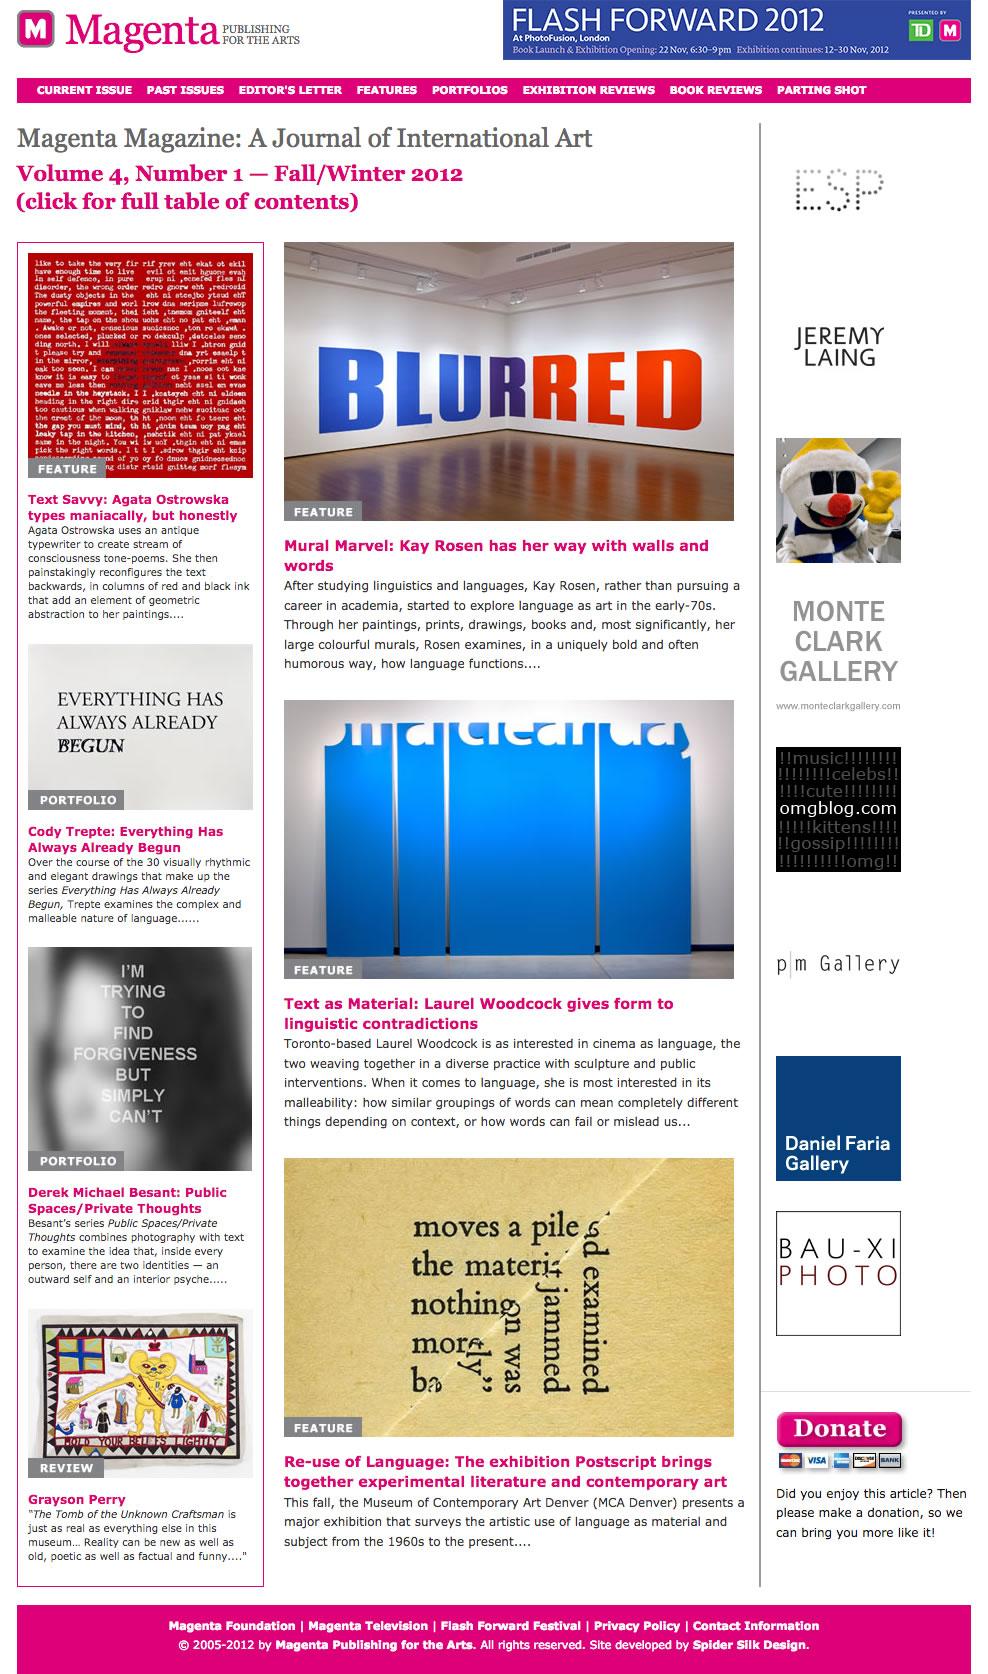 Magenta Magazine web site screenshot